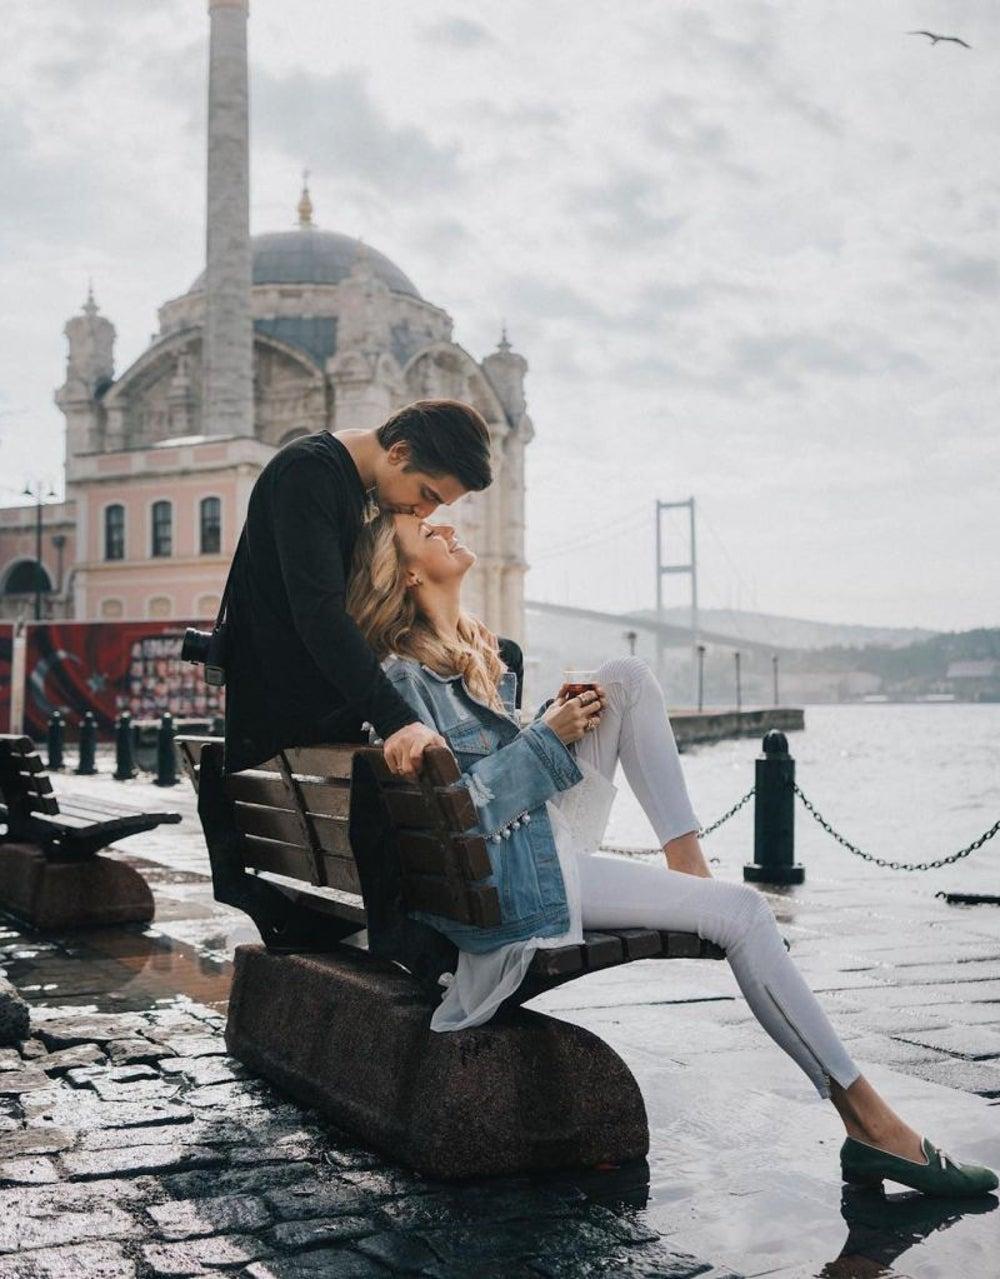 Ortakoy Mosque, Istanbul promenade, Turkey